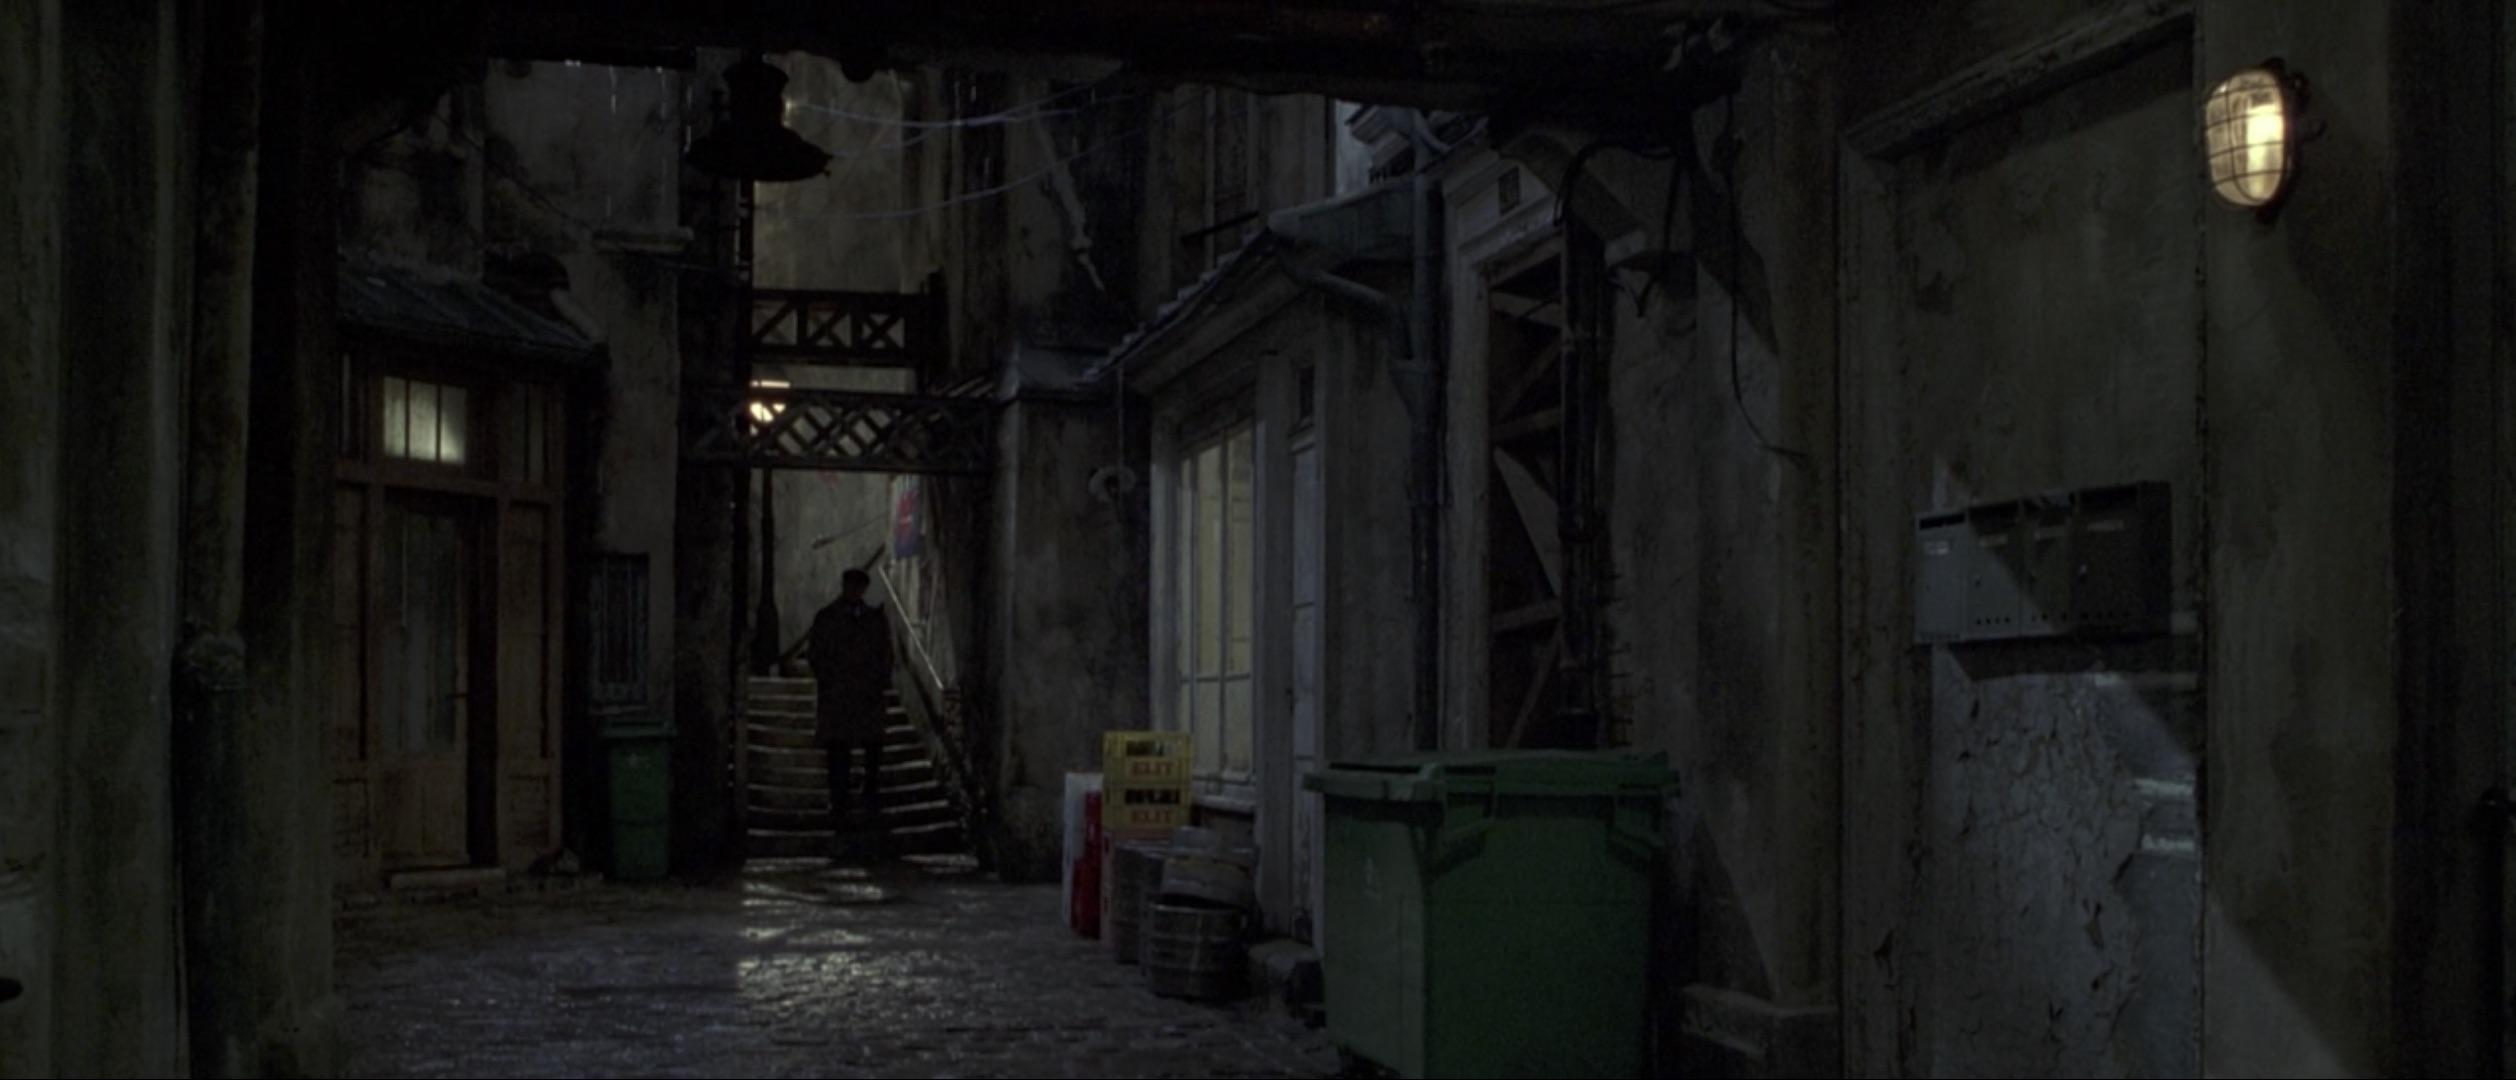 Ronin dark alley scene